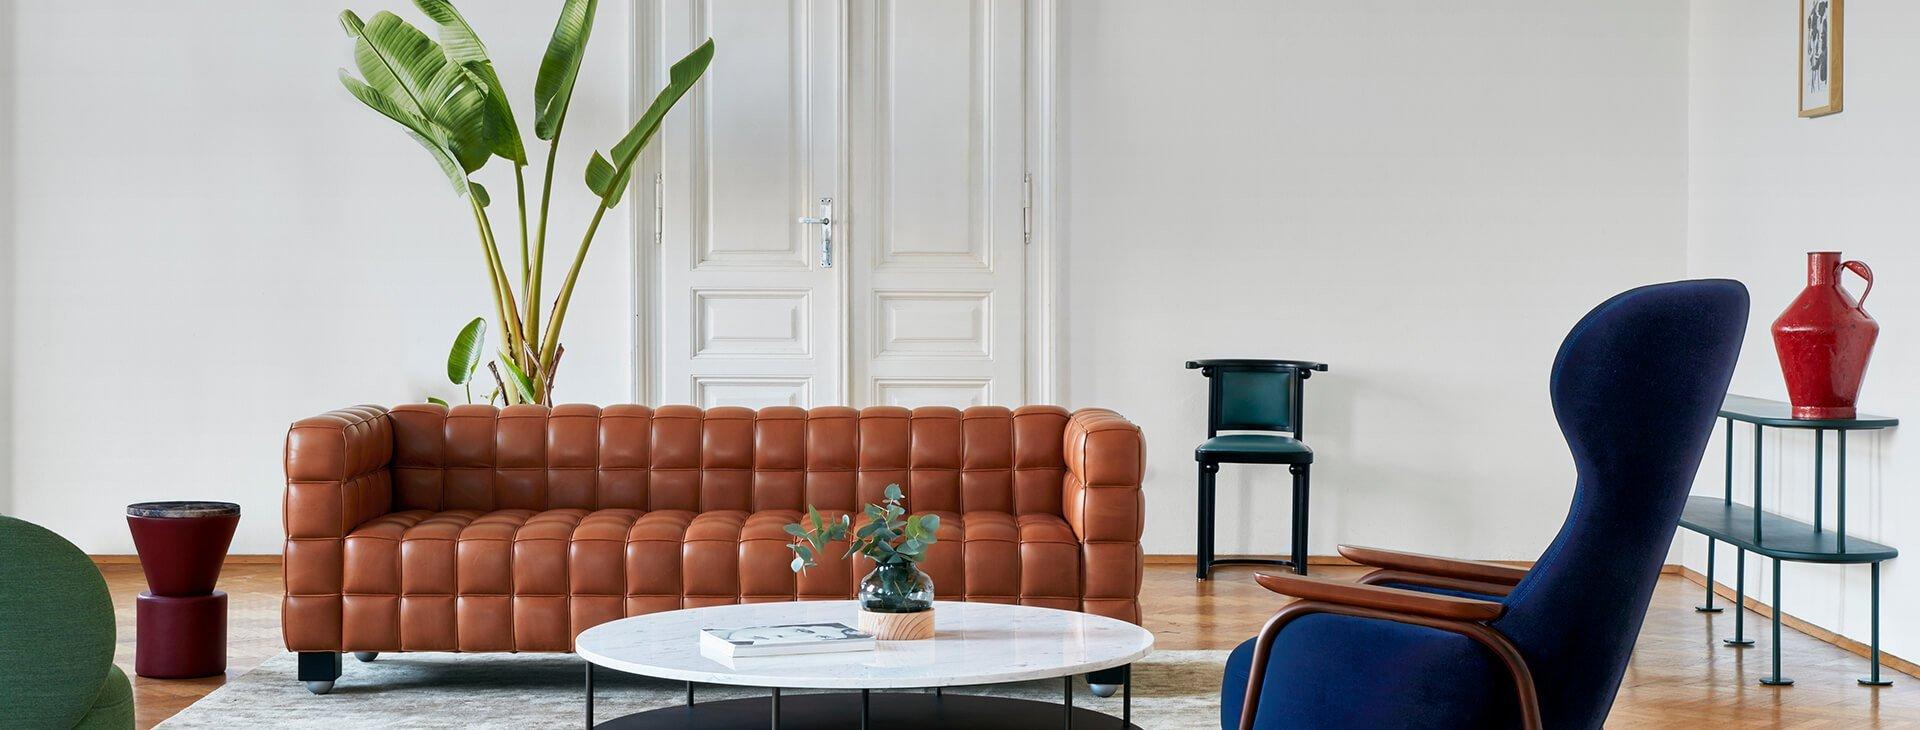 hamburg stilwerk. Black Bedroom Furniture Sets. Home Design Ideas